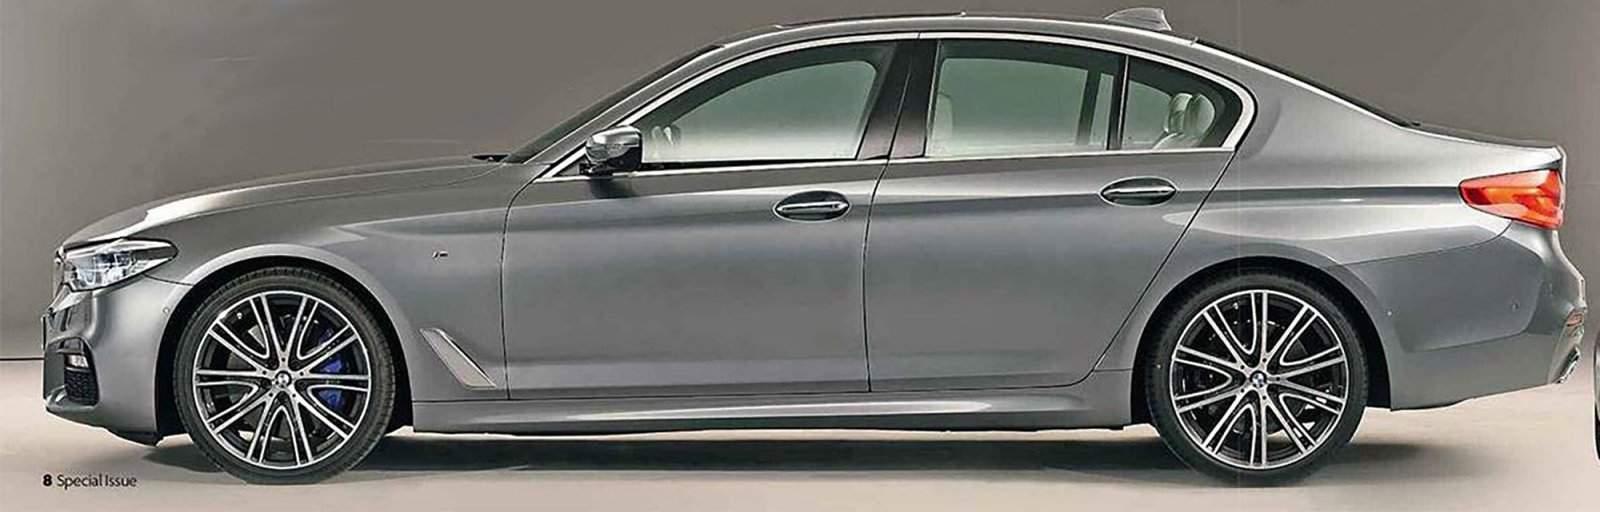 Name:  BMW-5-Series-G30-b.jpg Views: 16375 Size:  76.0 KB